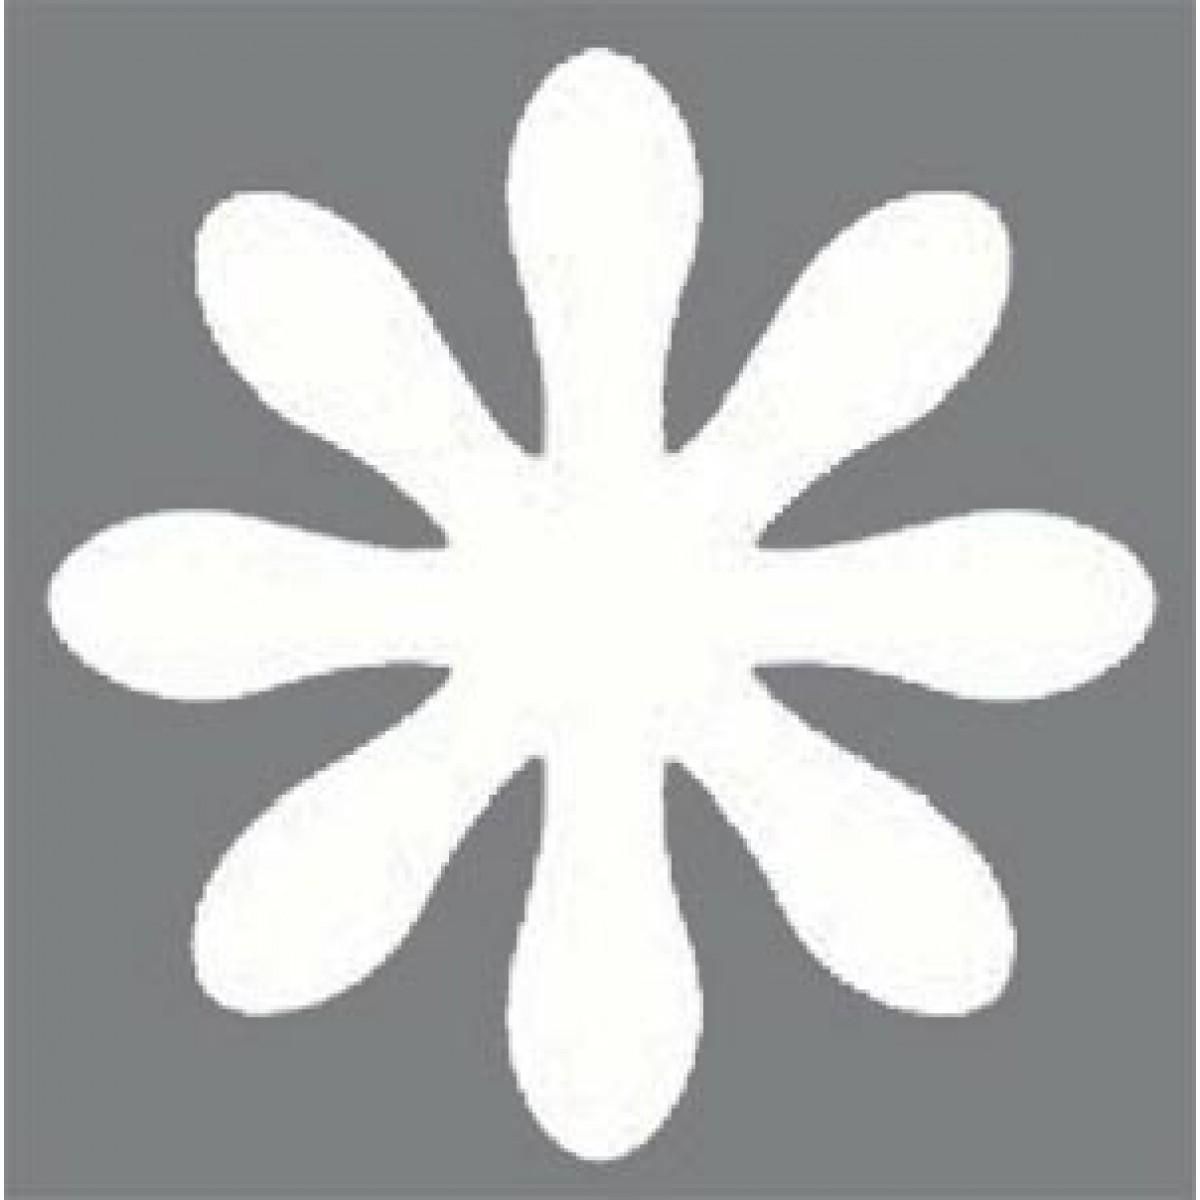 Rayher Φιγουροκόπτης Μαργαρίτα (3 Μεγ.) Υλικά Χειροτεχνίας